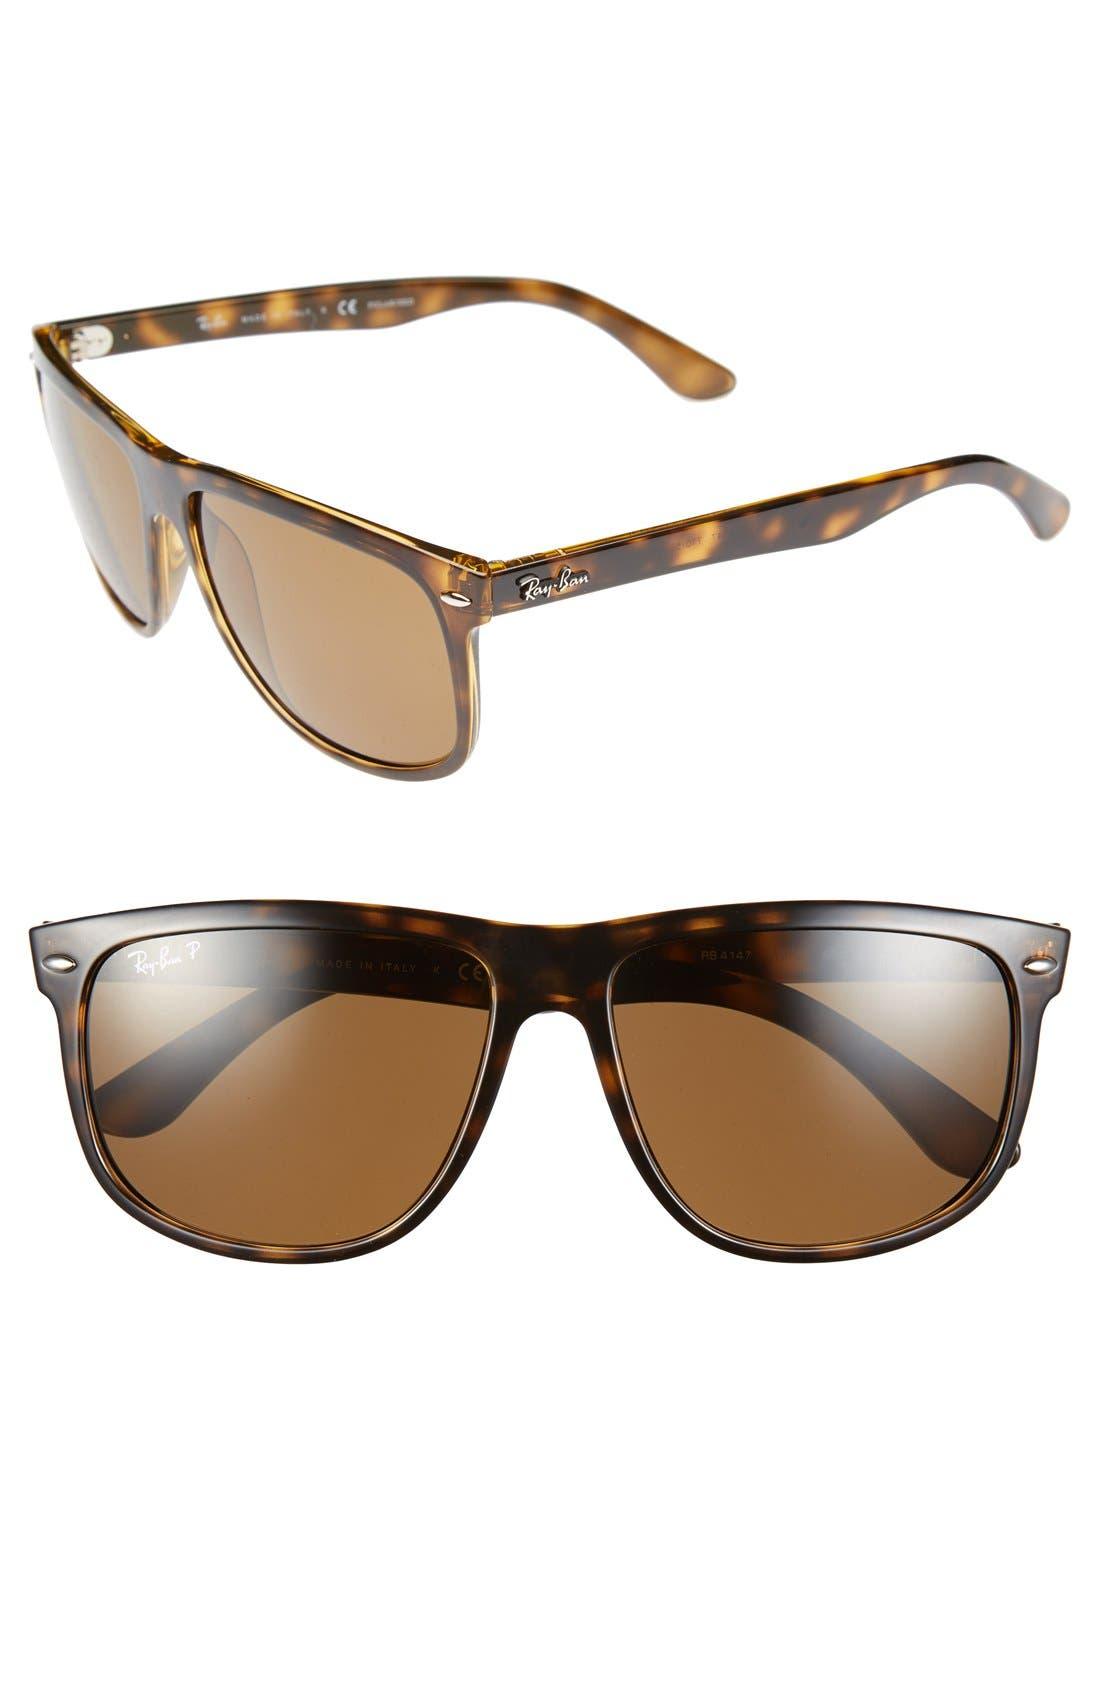 Ray Ban Sunglasses 'BOYFRIEND' 60MM POLARIZED SUNGLASSES